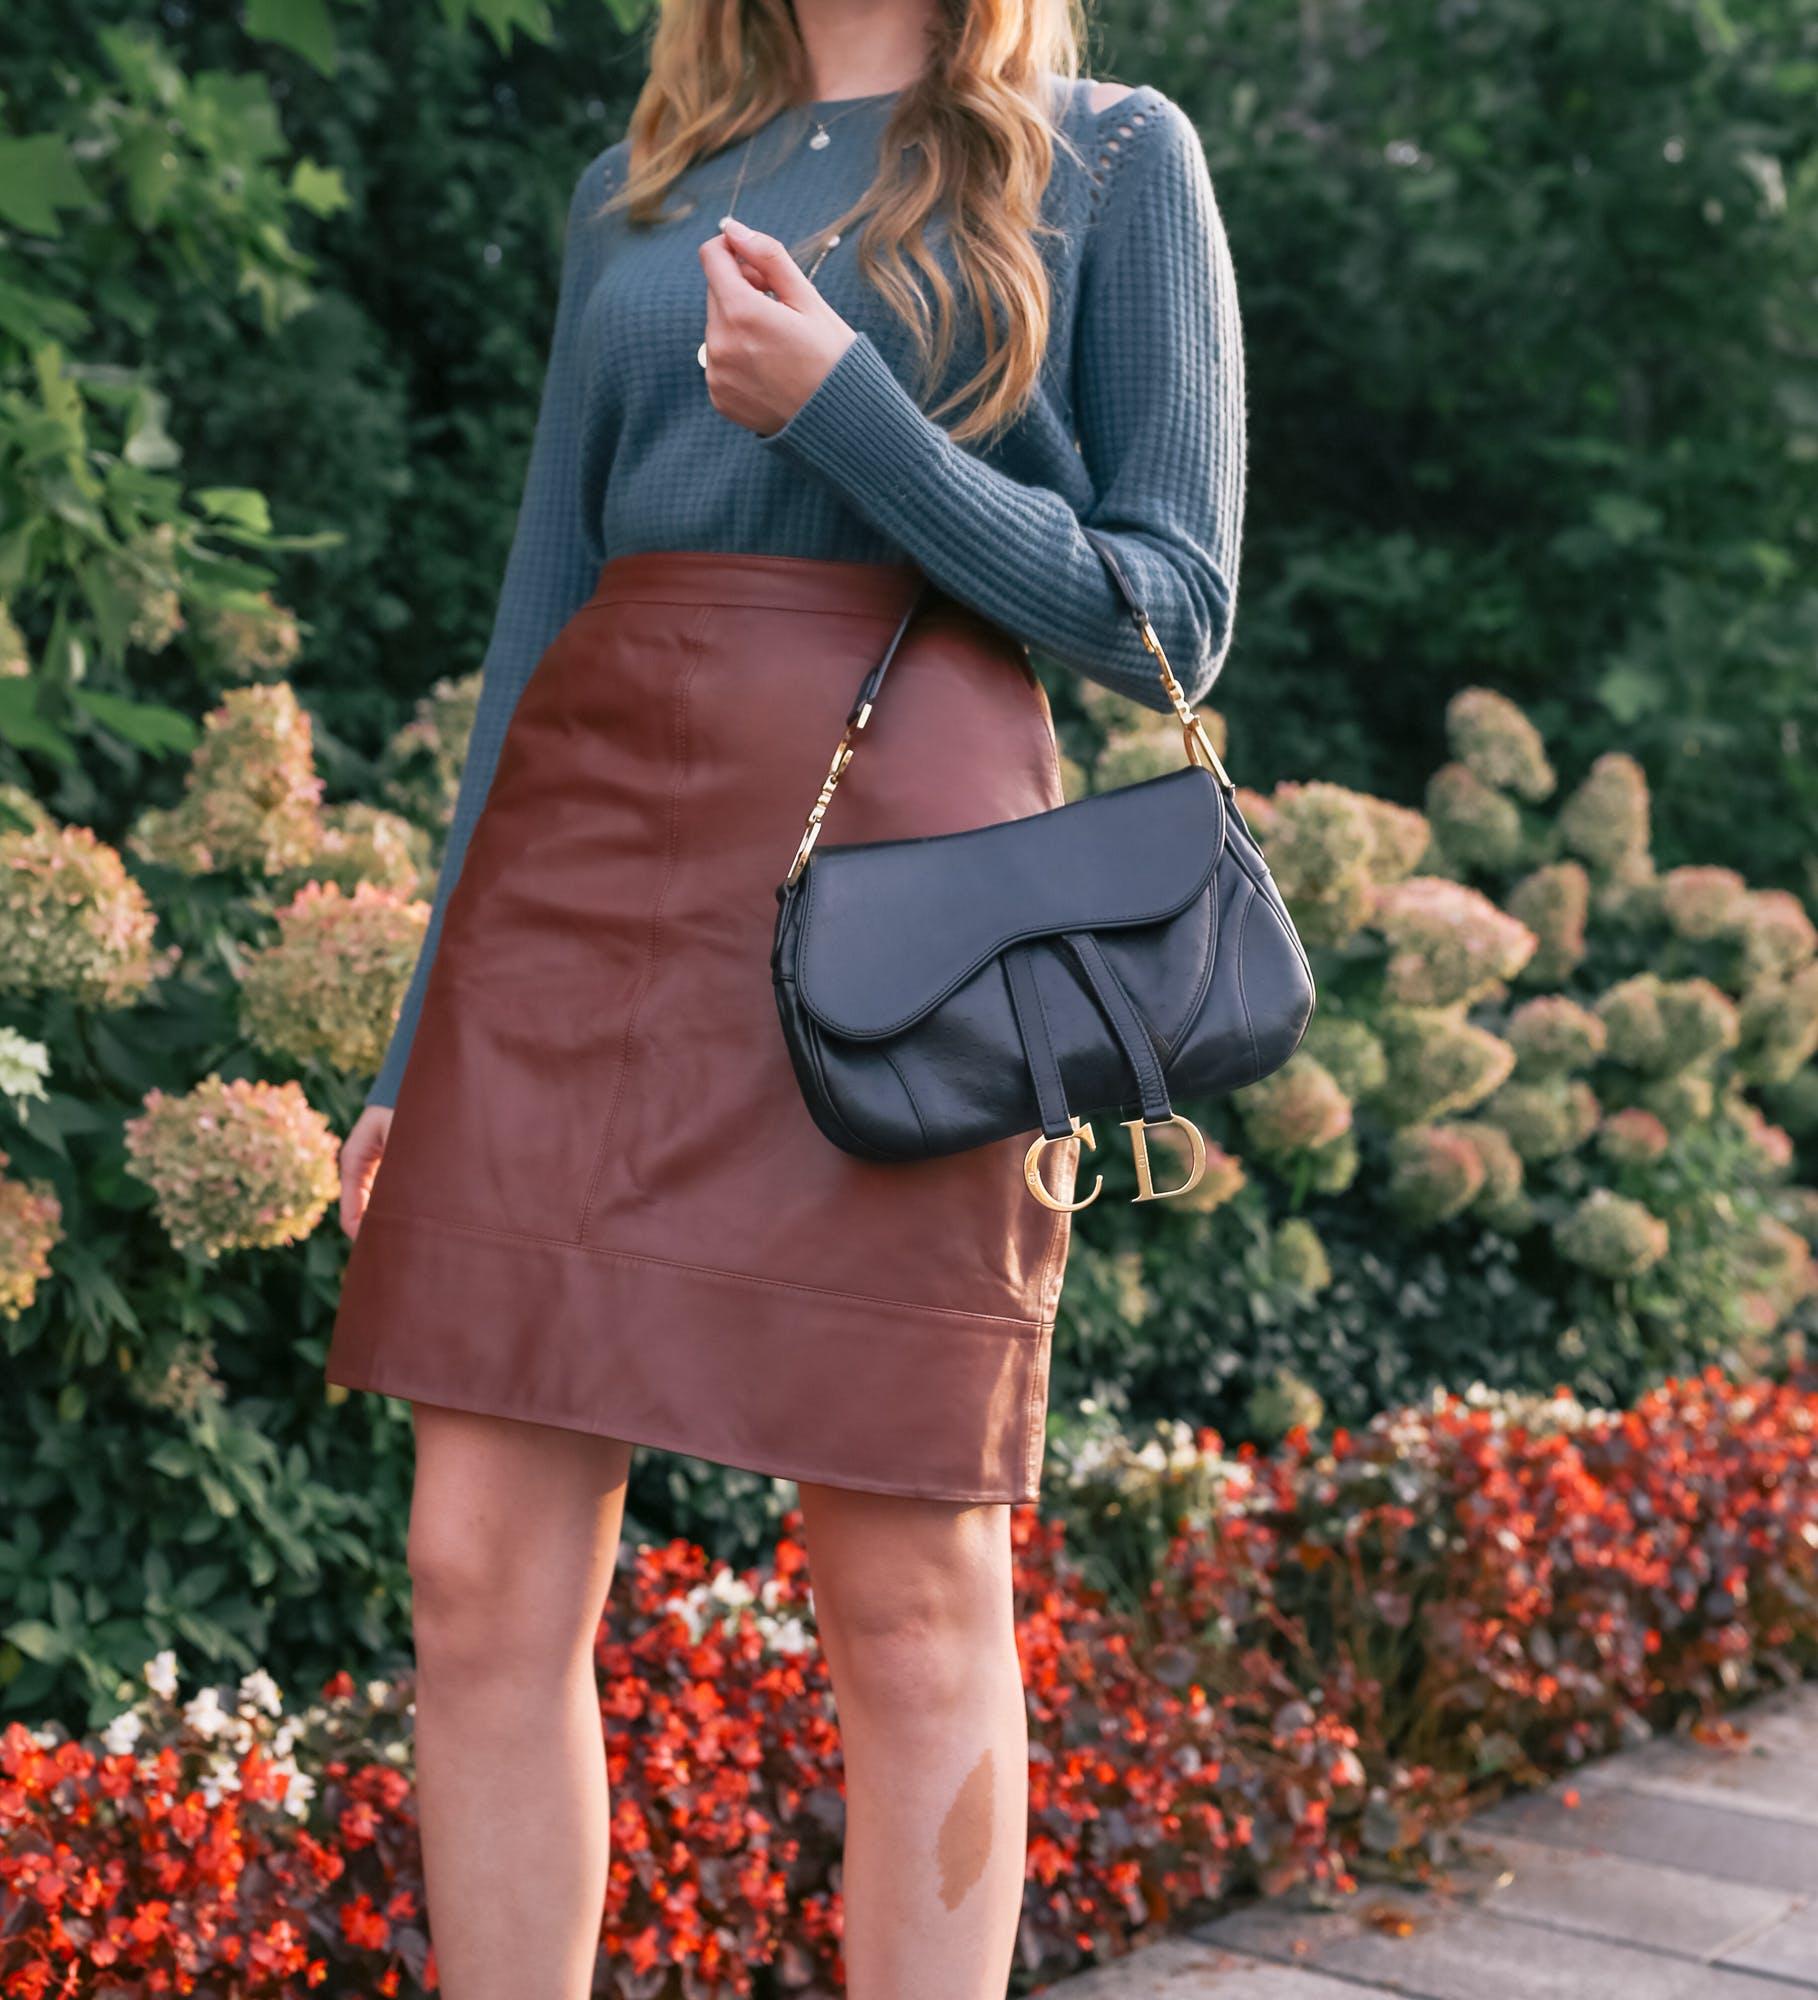 Christian Dior Saddle Bag Review